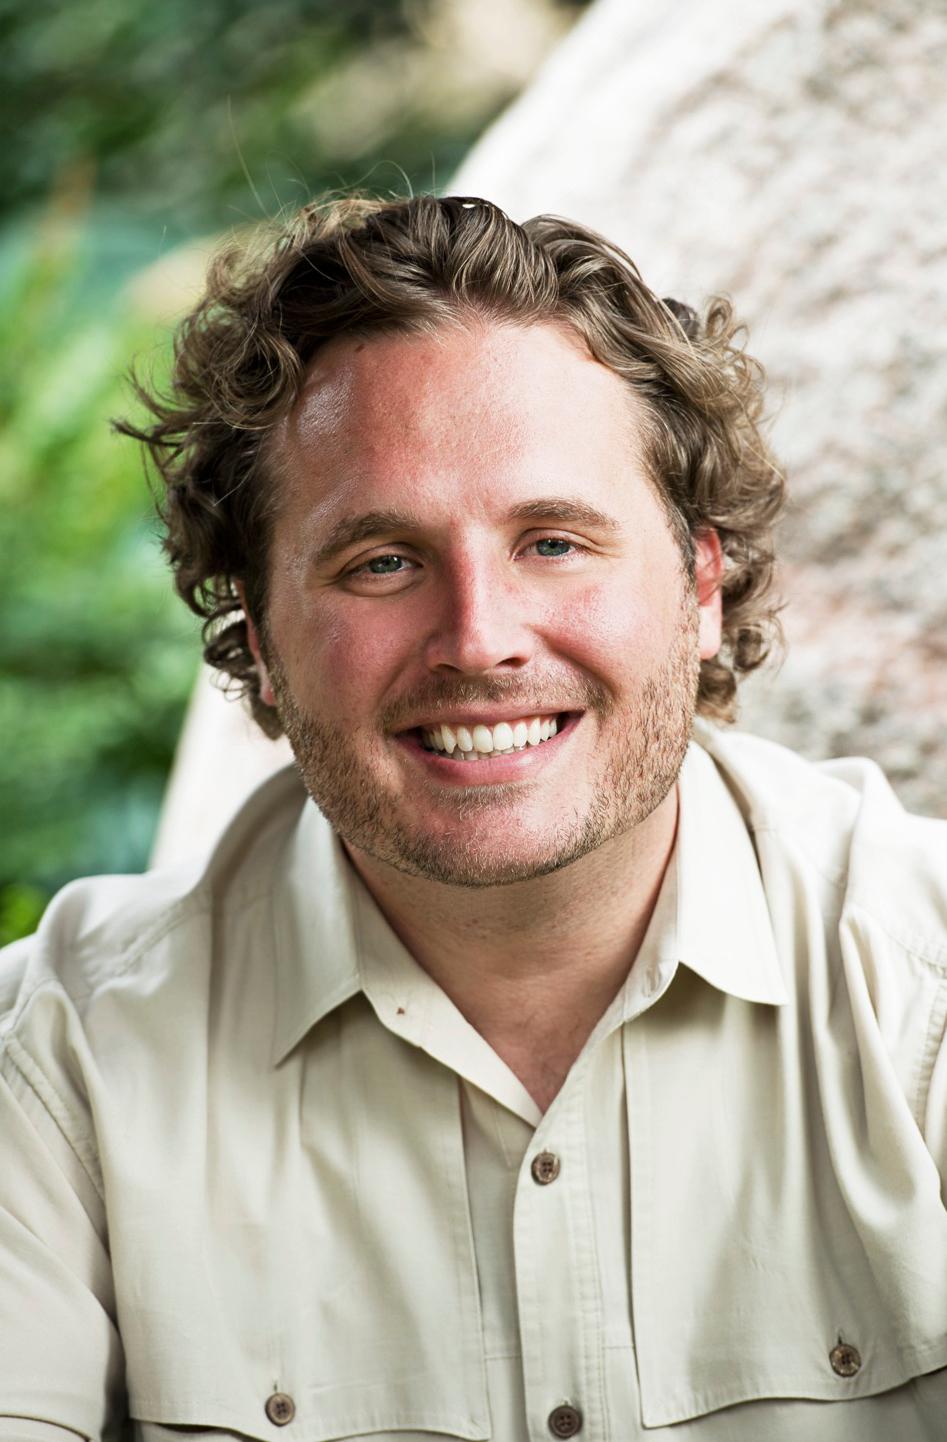 Caleb Harper (Photo: MIT Media Lab)